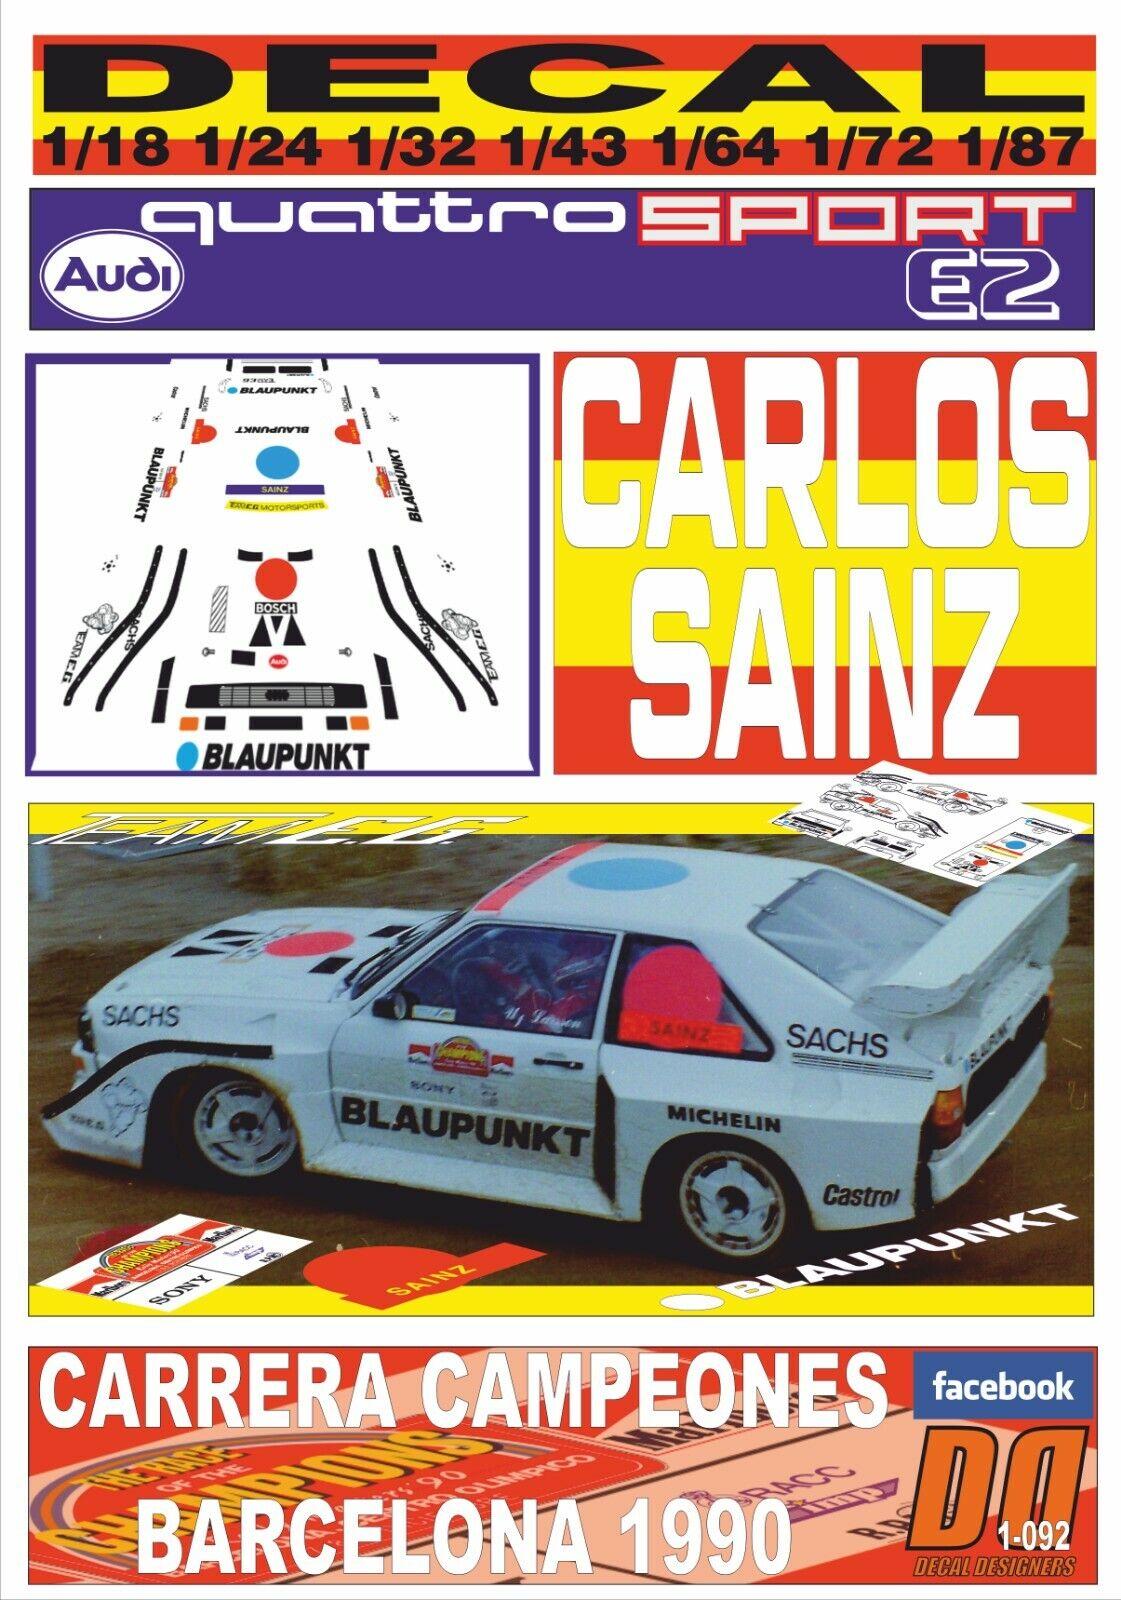 DECAL AUDI QUATTRO S1 red C. SAINZ CARRERA CAMPEONES BARCELONA 1990 (05)